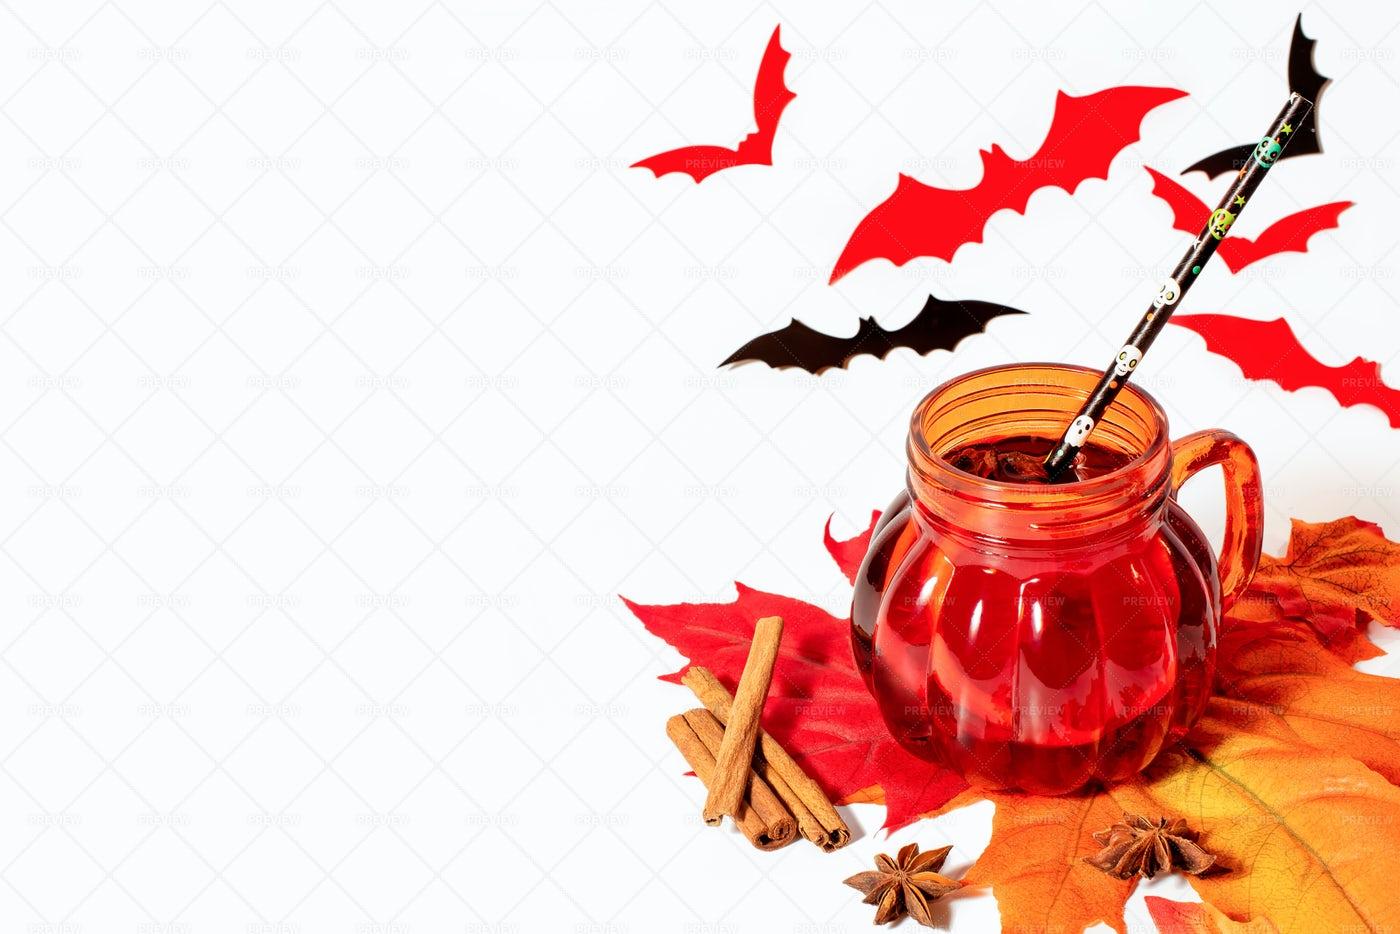 Halloween Mulled Wine Background: Stock Photos